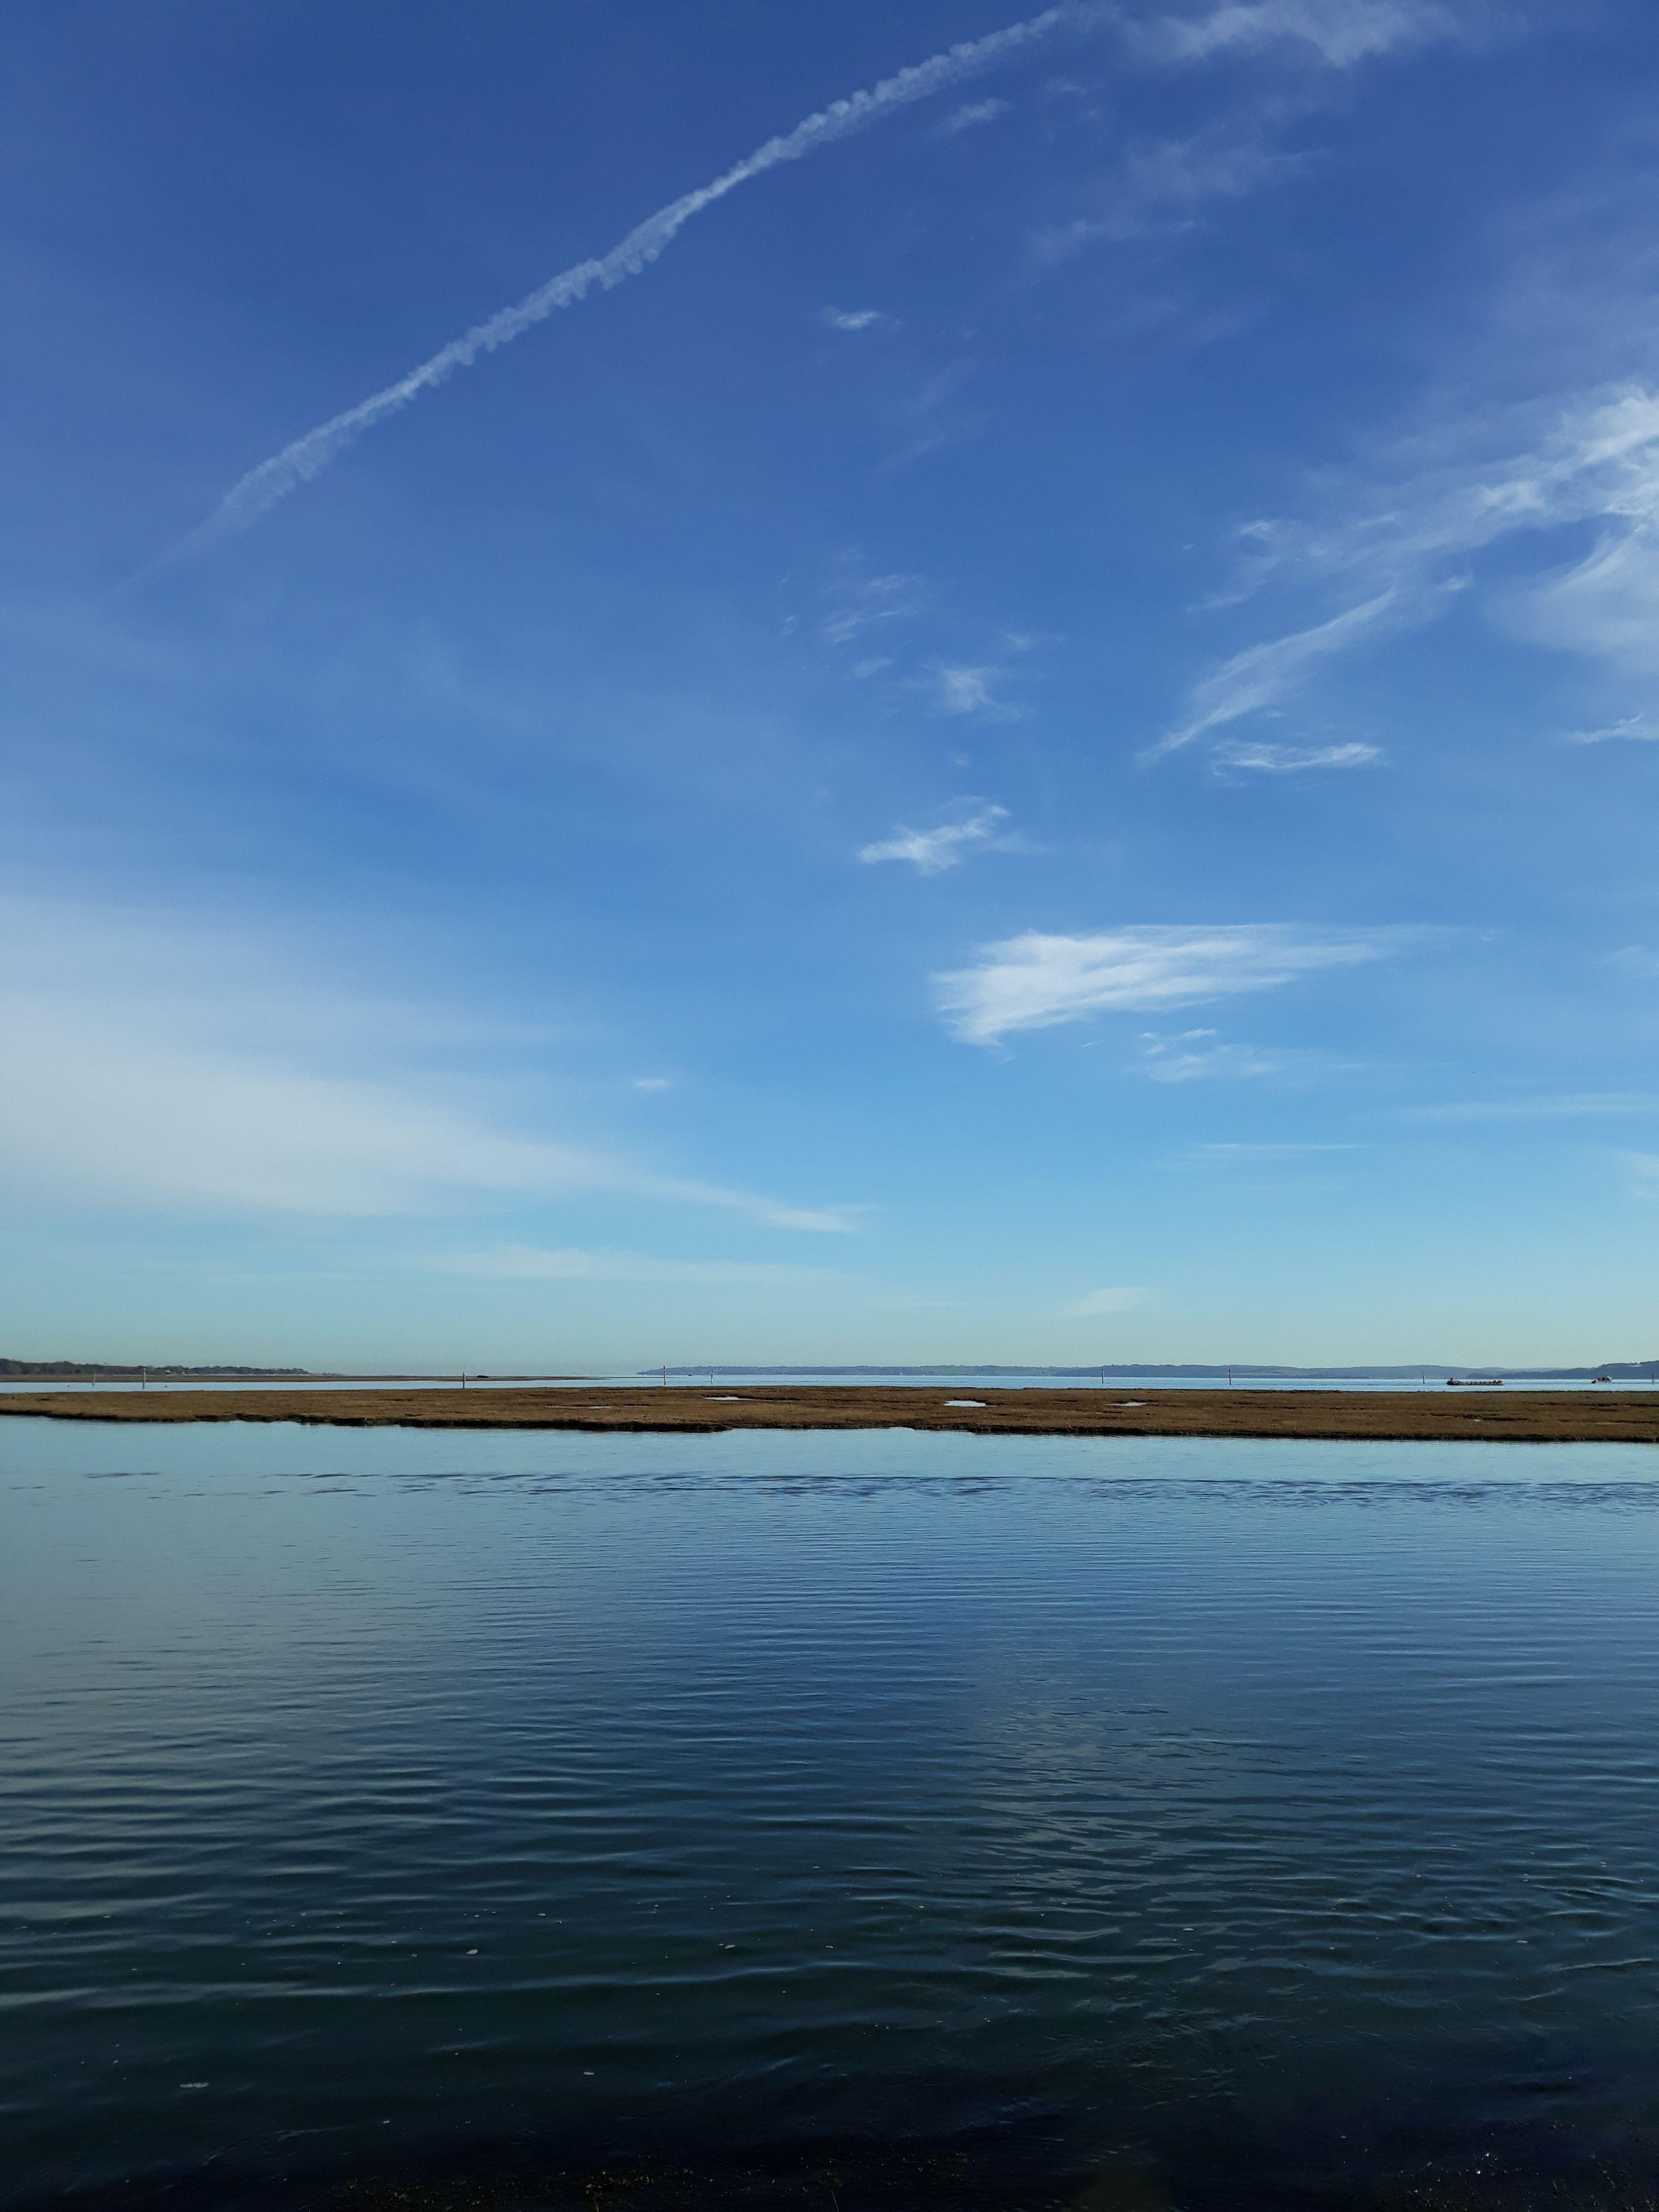 Ocean and sky in Lymington